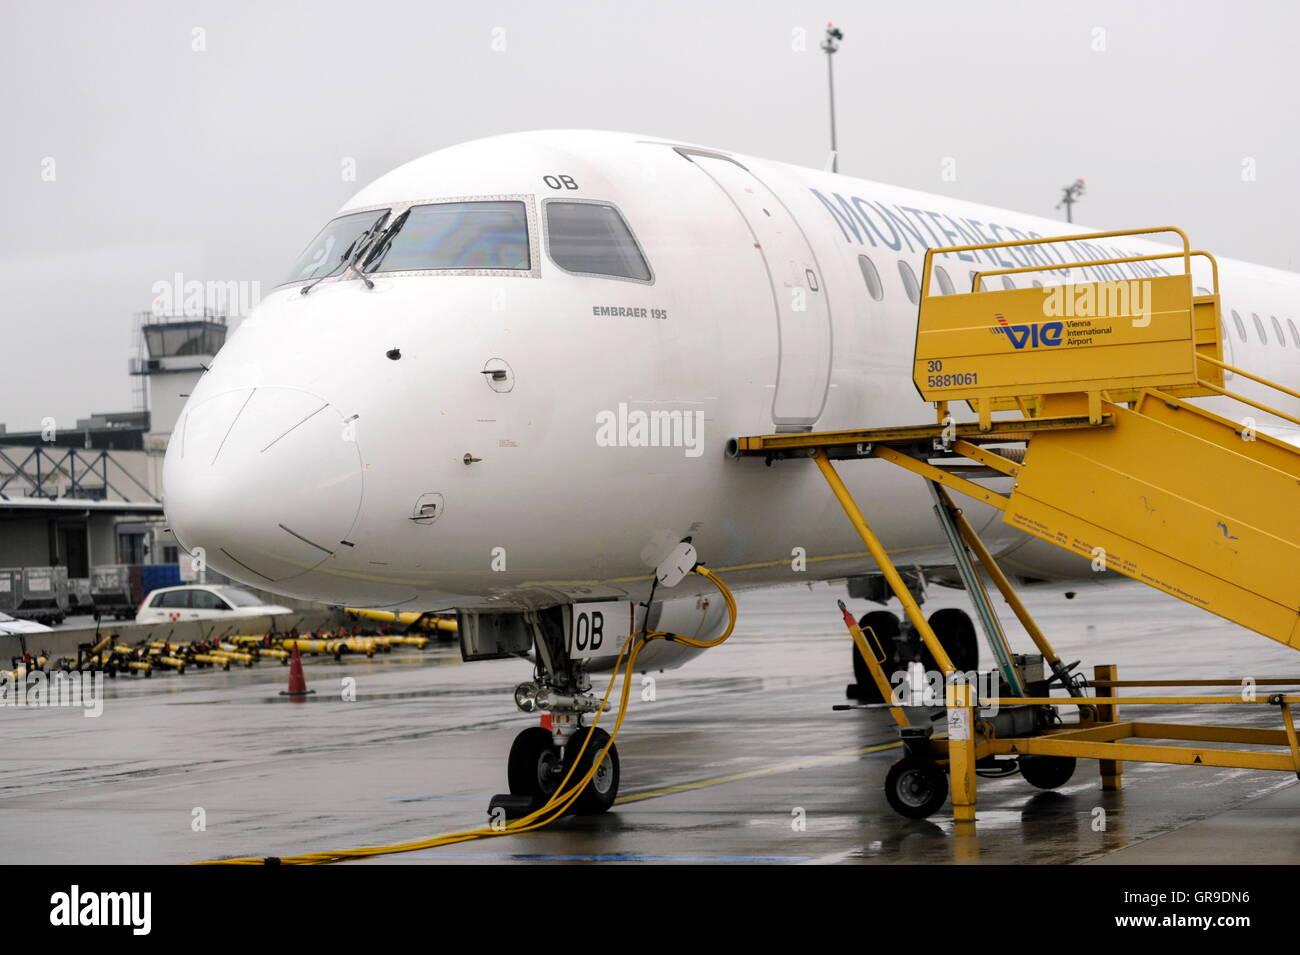 Montenegro Airlines At The Vienna International Airport Stock Photo